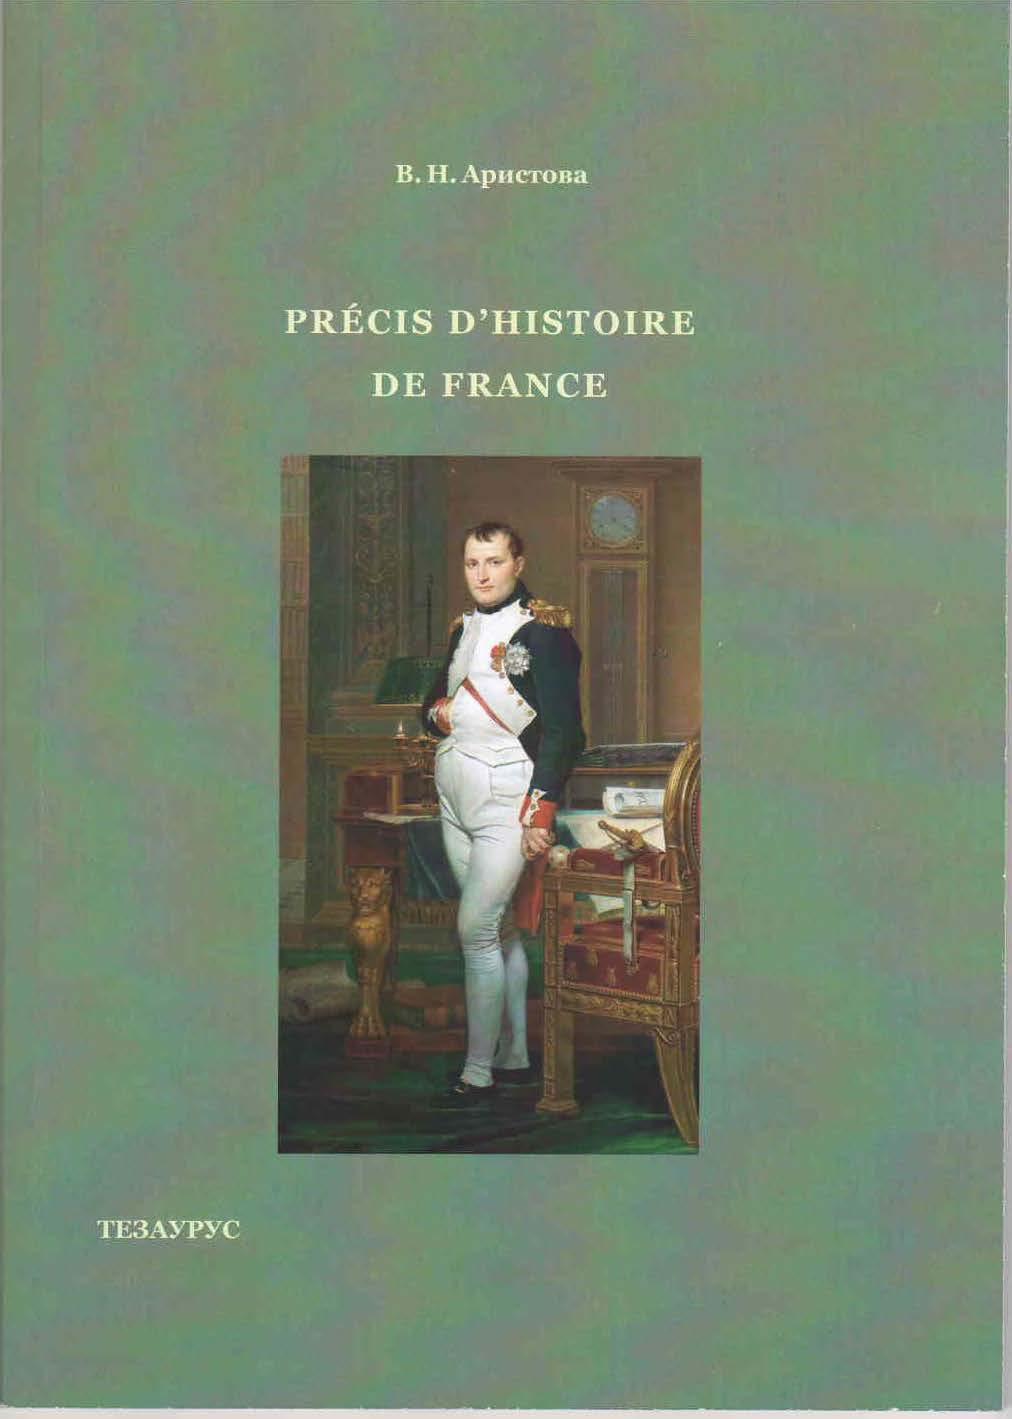 Précis d'histoire de France: учебное пособие по истории Франции